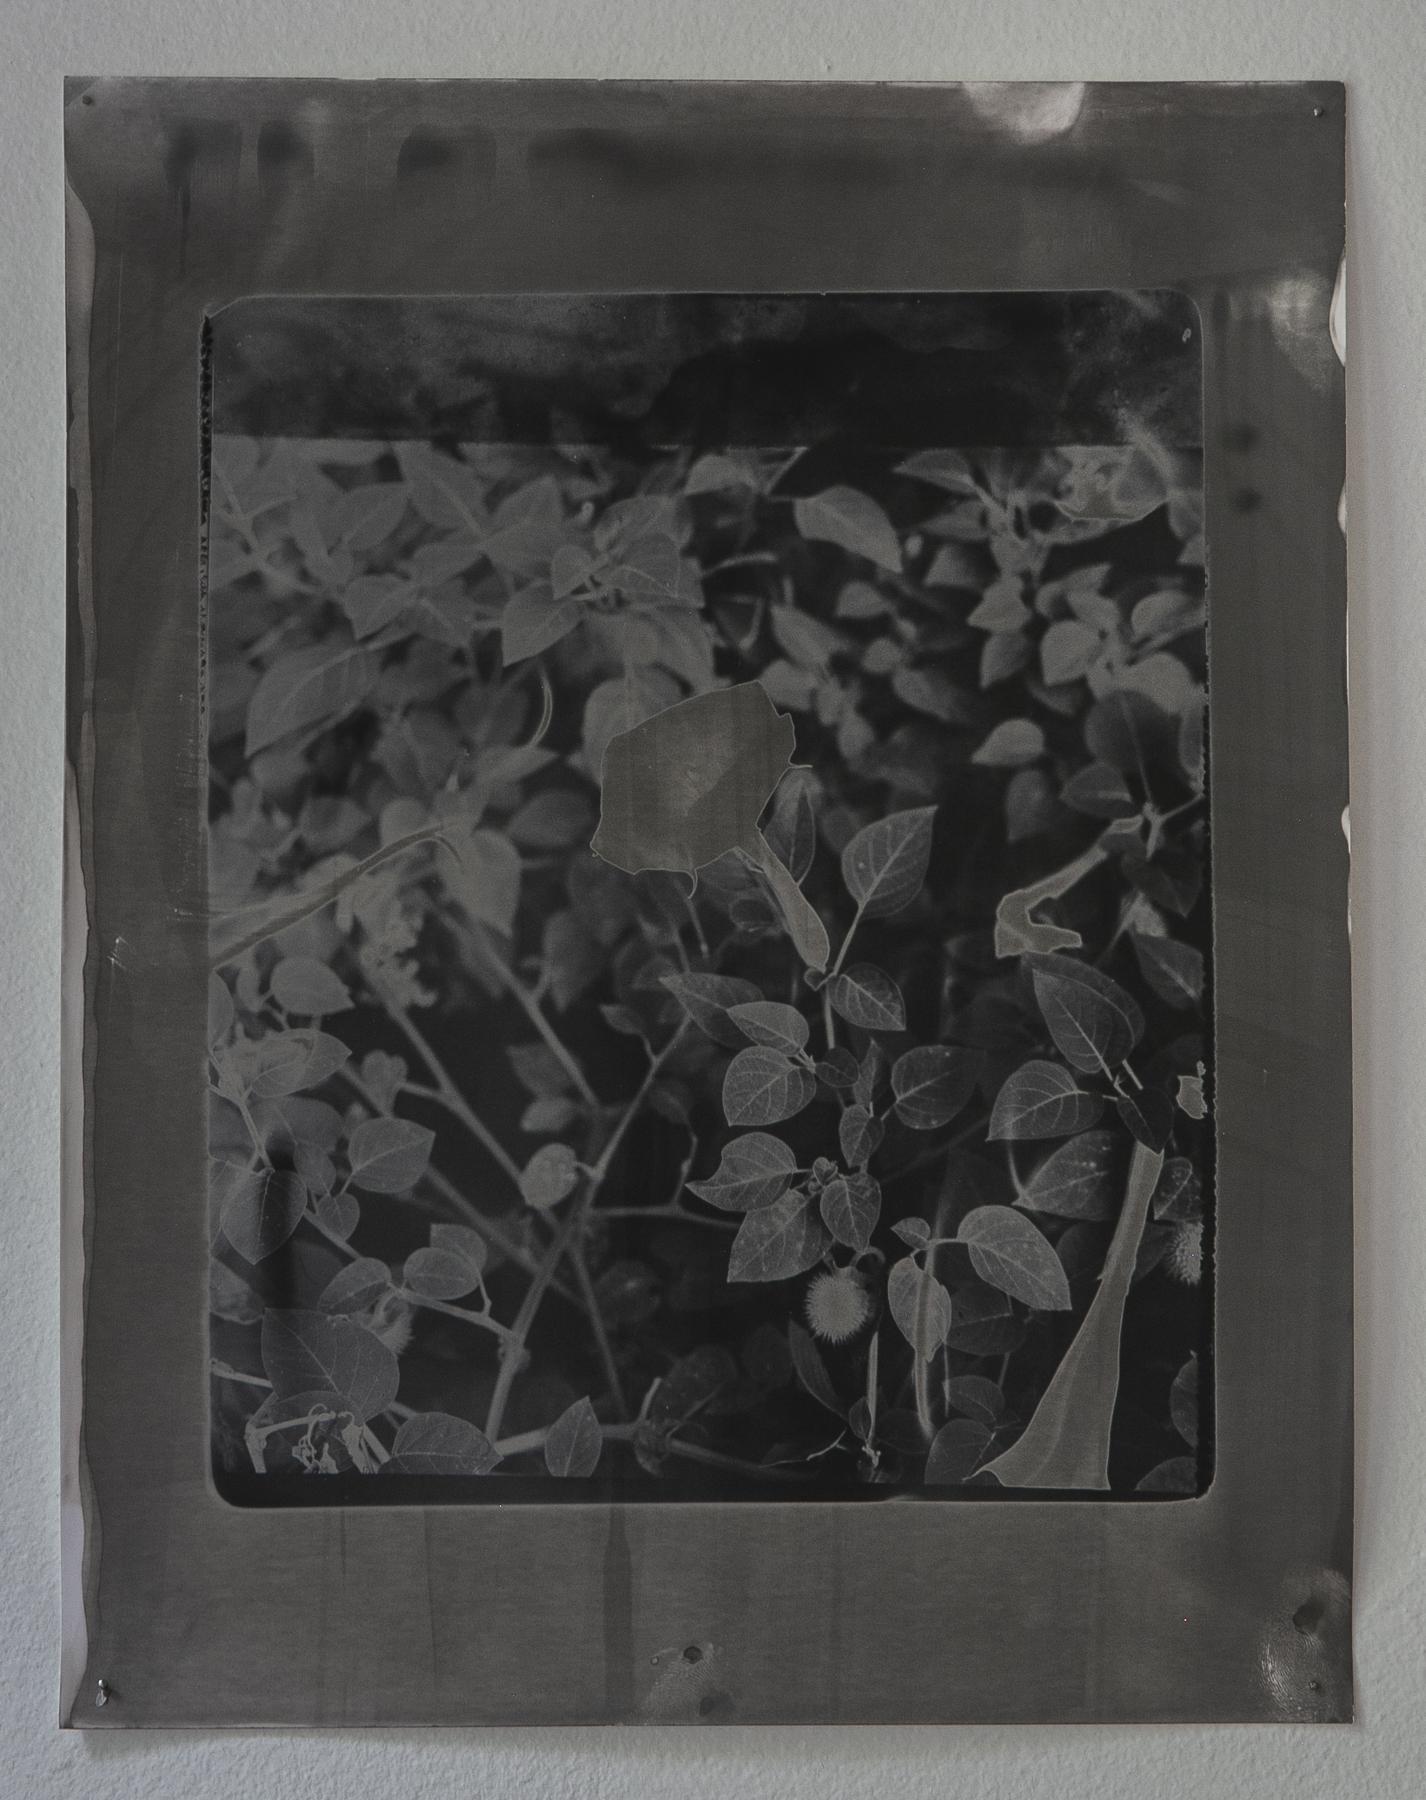 Daniel Hojnacki,  Moon Flower (II),  Silver gelatin print, 2019